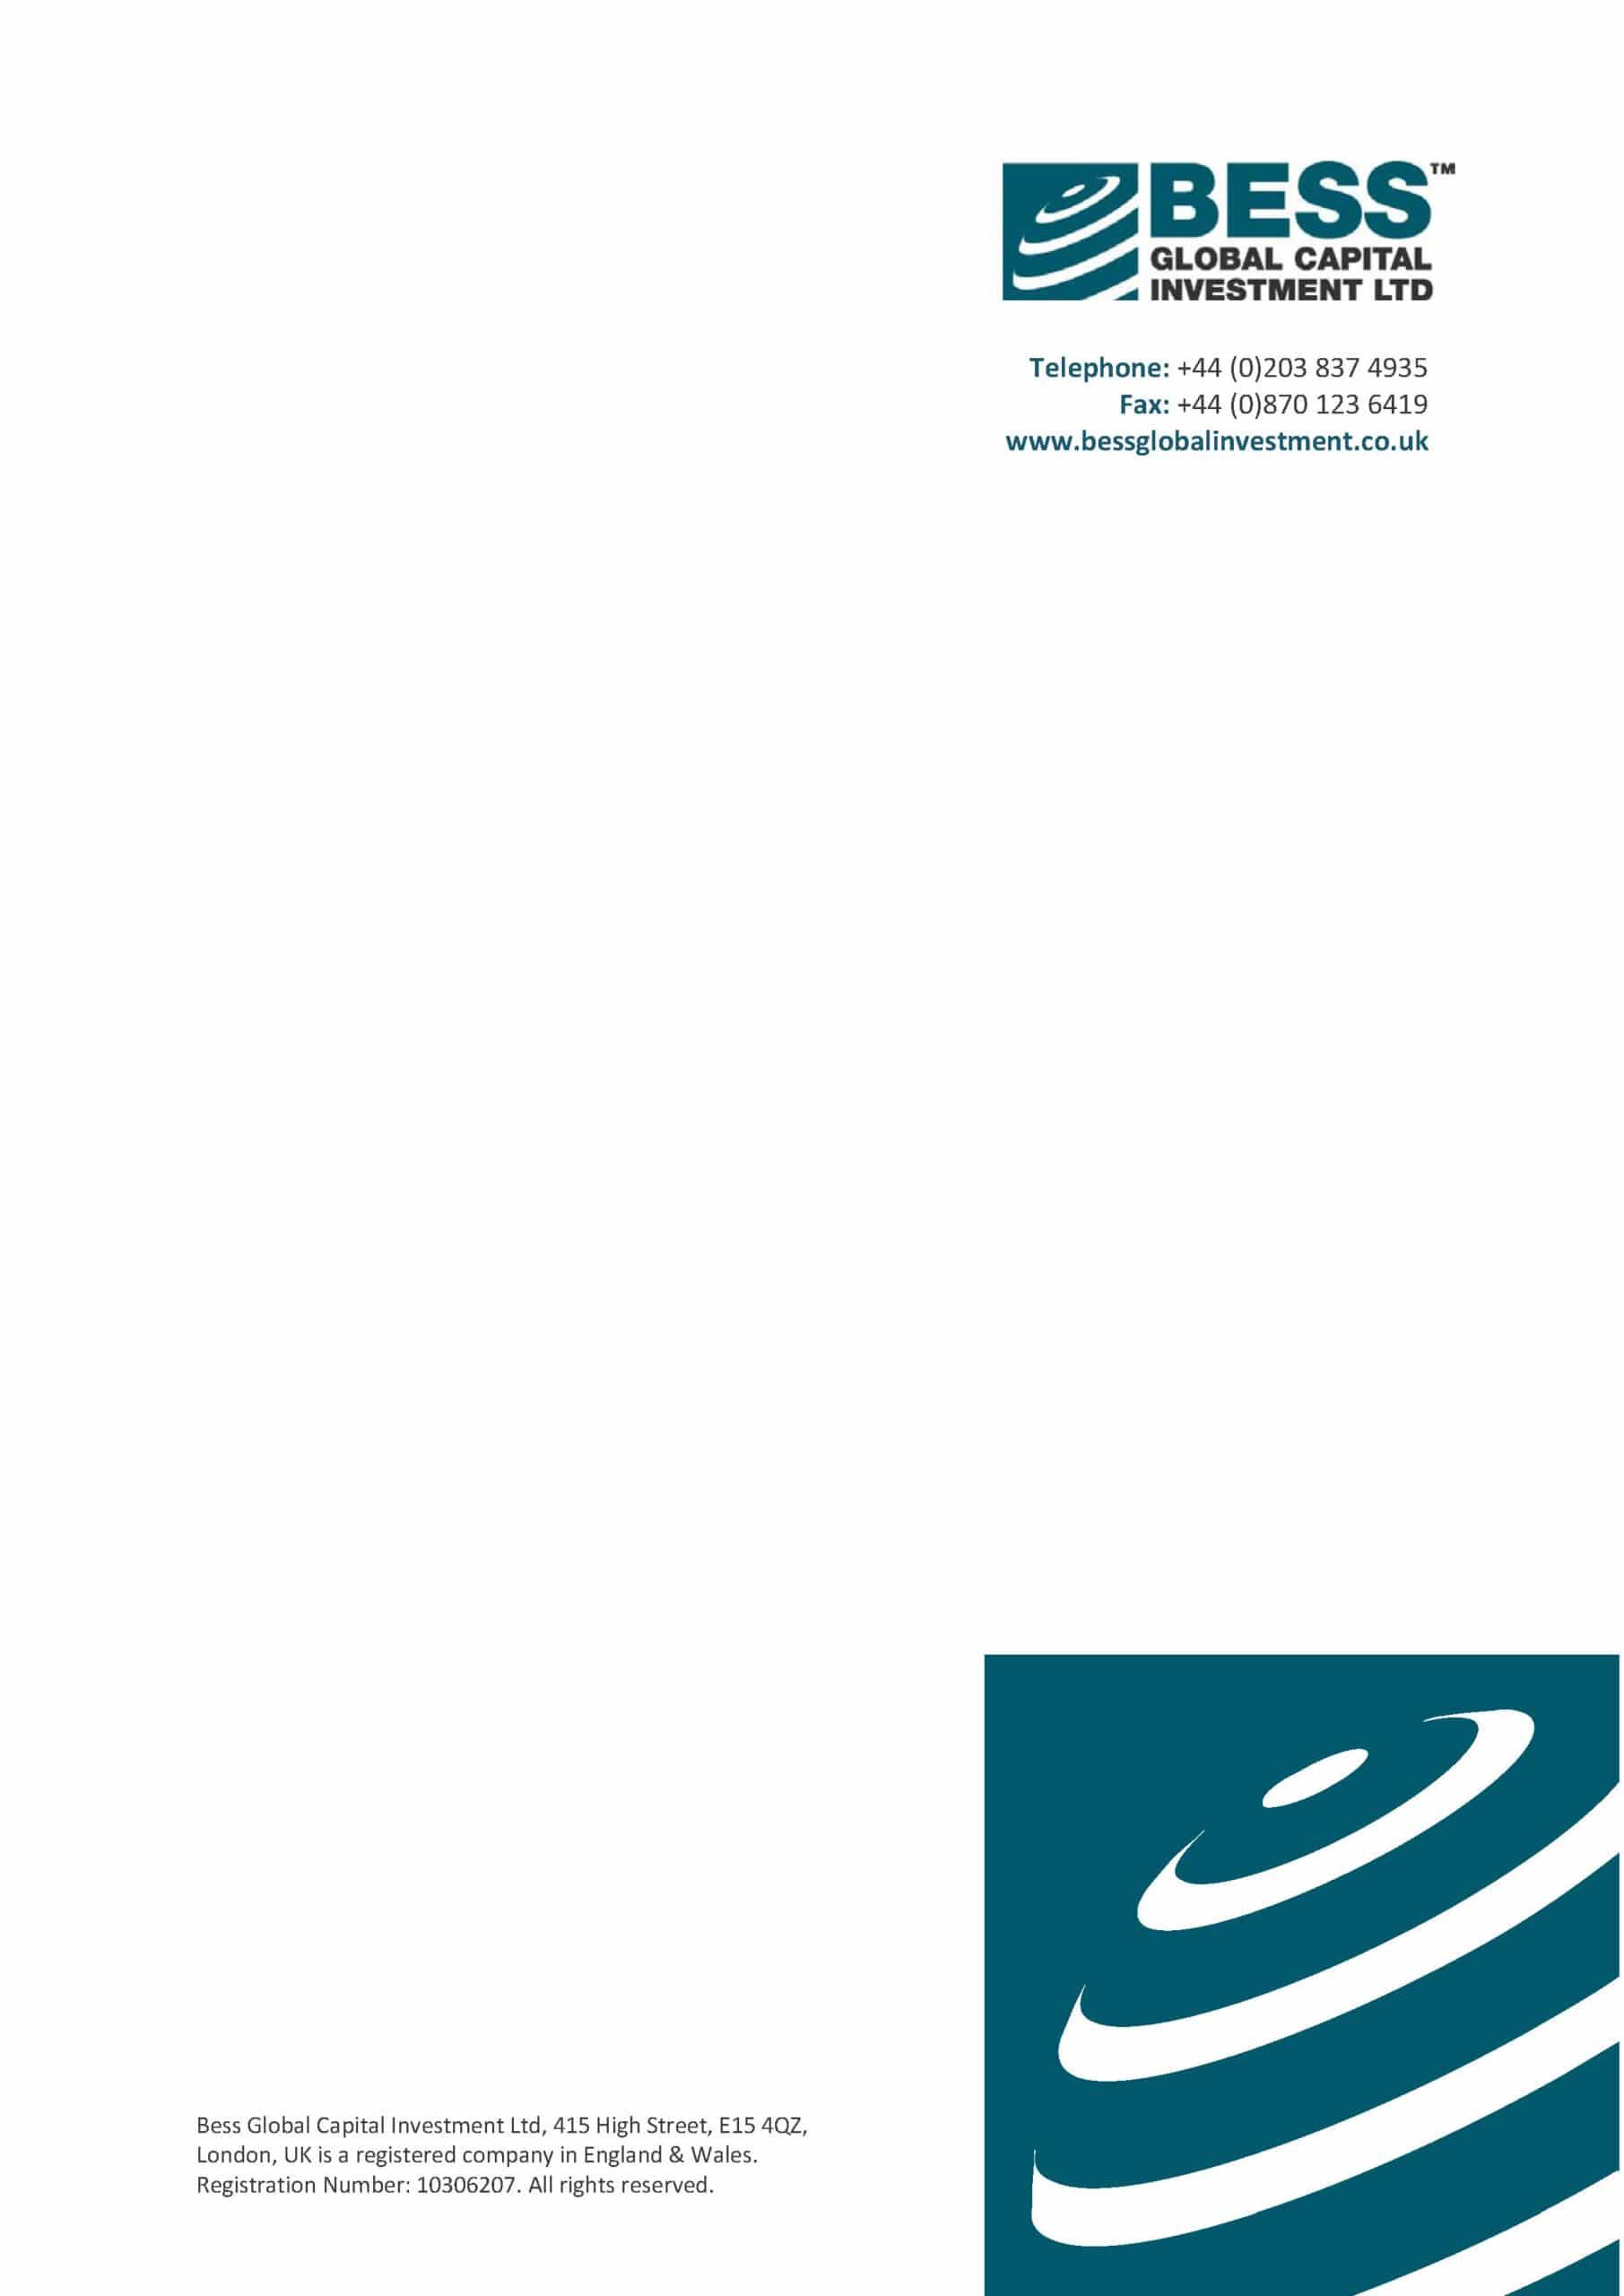 Bess-Global-Capital-Investment-Ltd-Letterhead